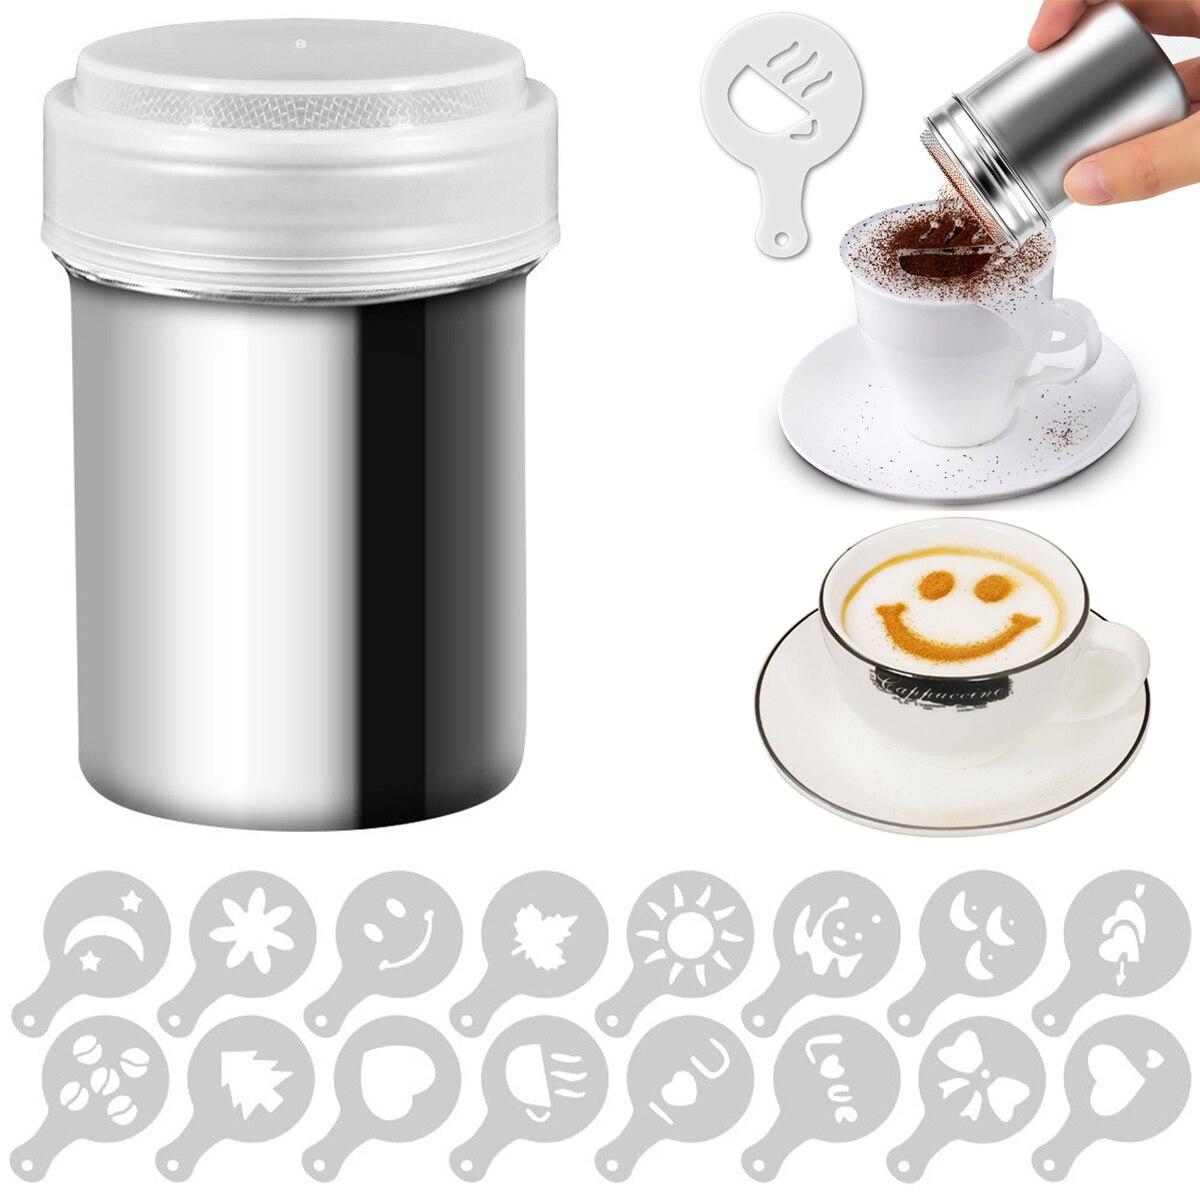 Cappuccino Mold Fancy Coffee Printing Model Foam Spray Cake Stencils Powdered Sugar Chocolate Cocoa Coffee Printing AssemblyD40